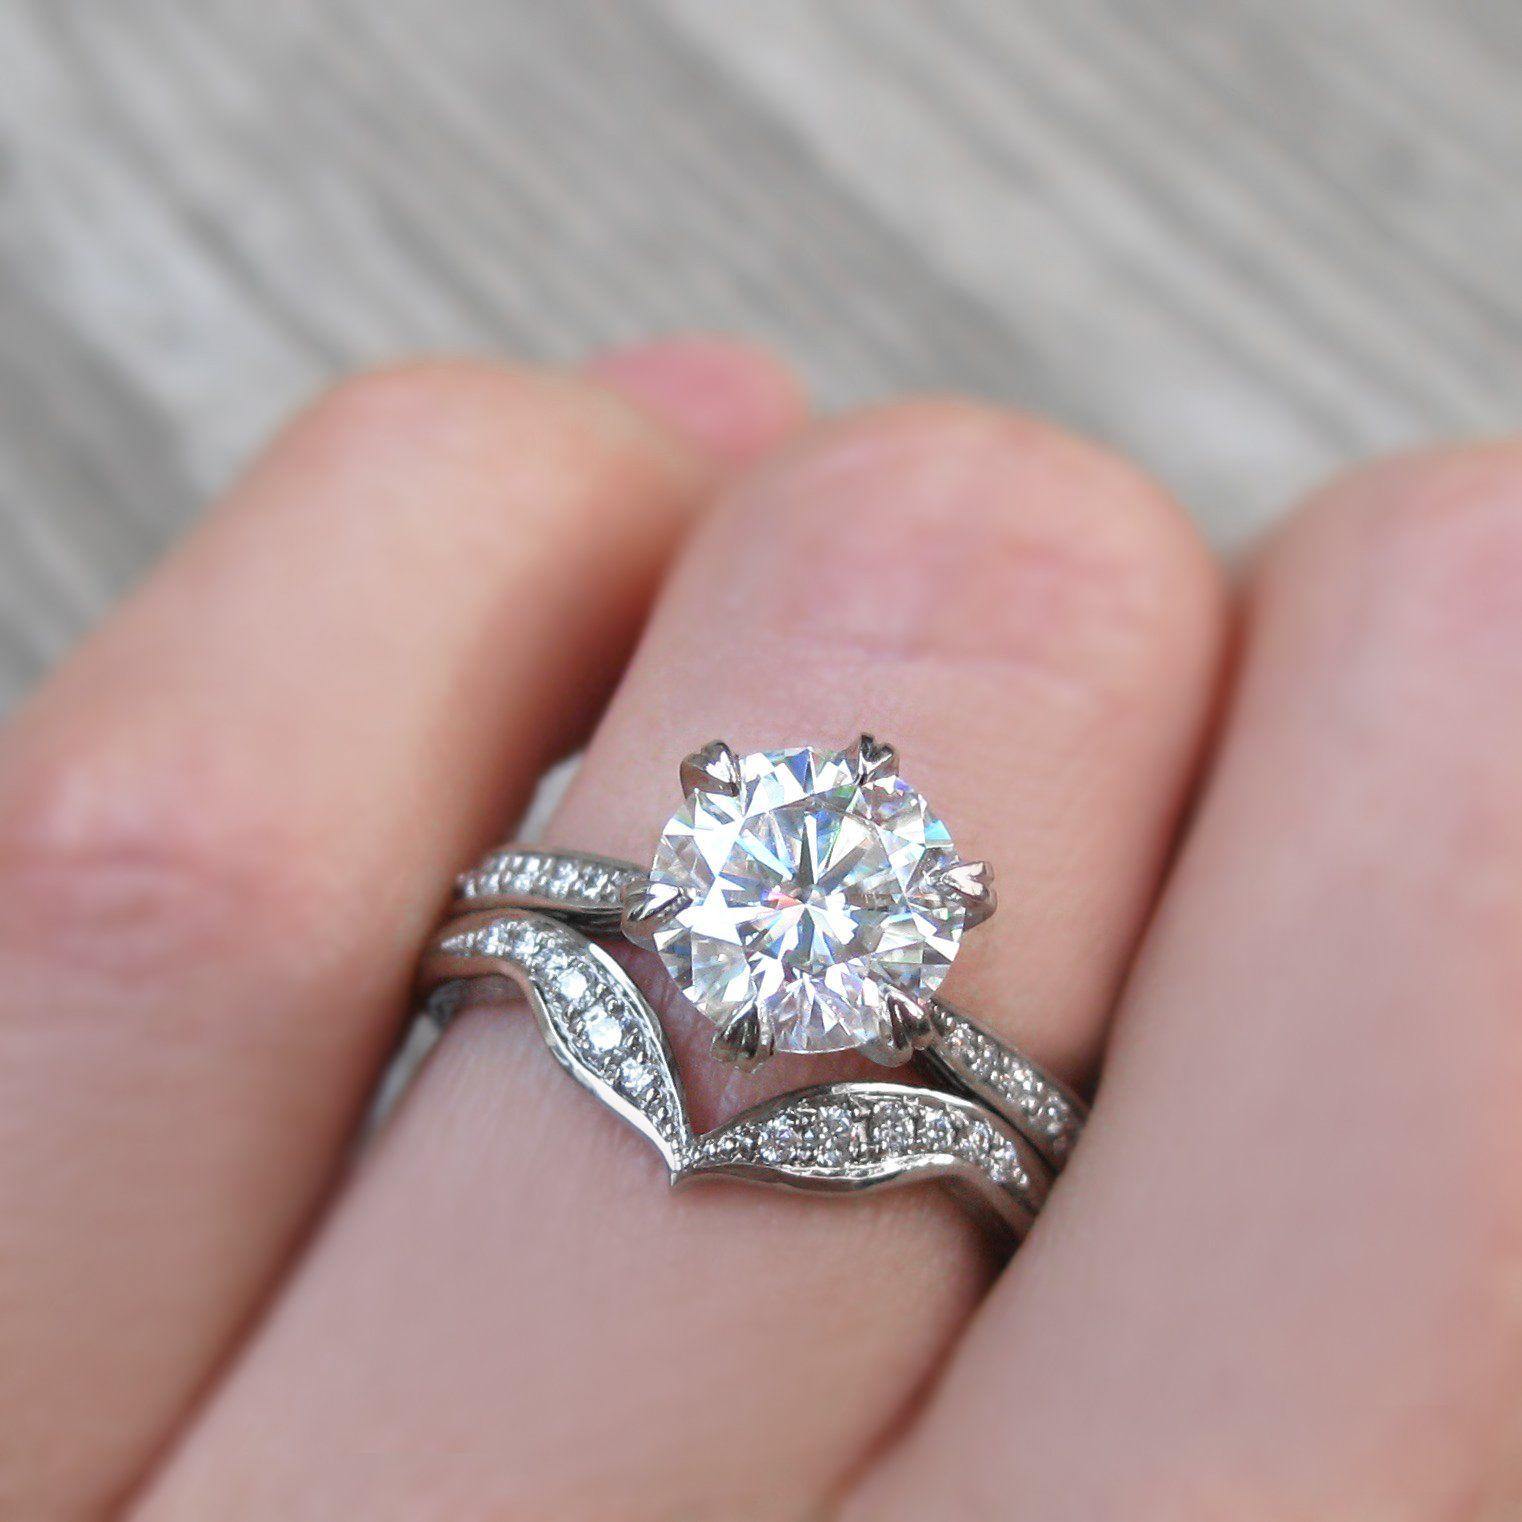 Pin by Chantal Gross on Future wedding ideas.. | Pinterest ...